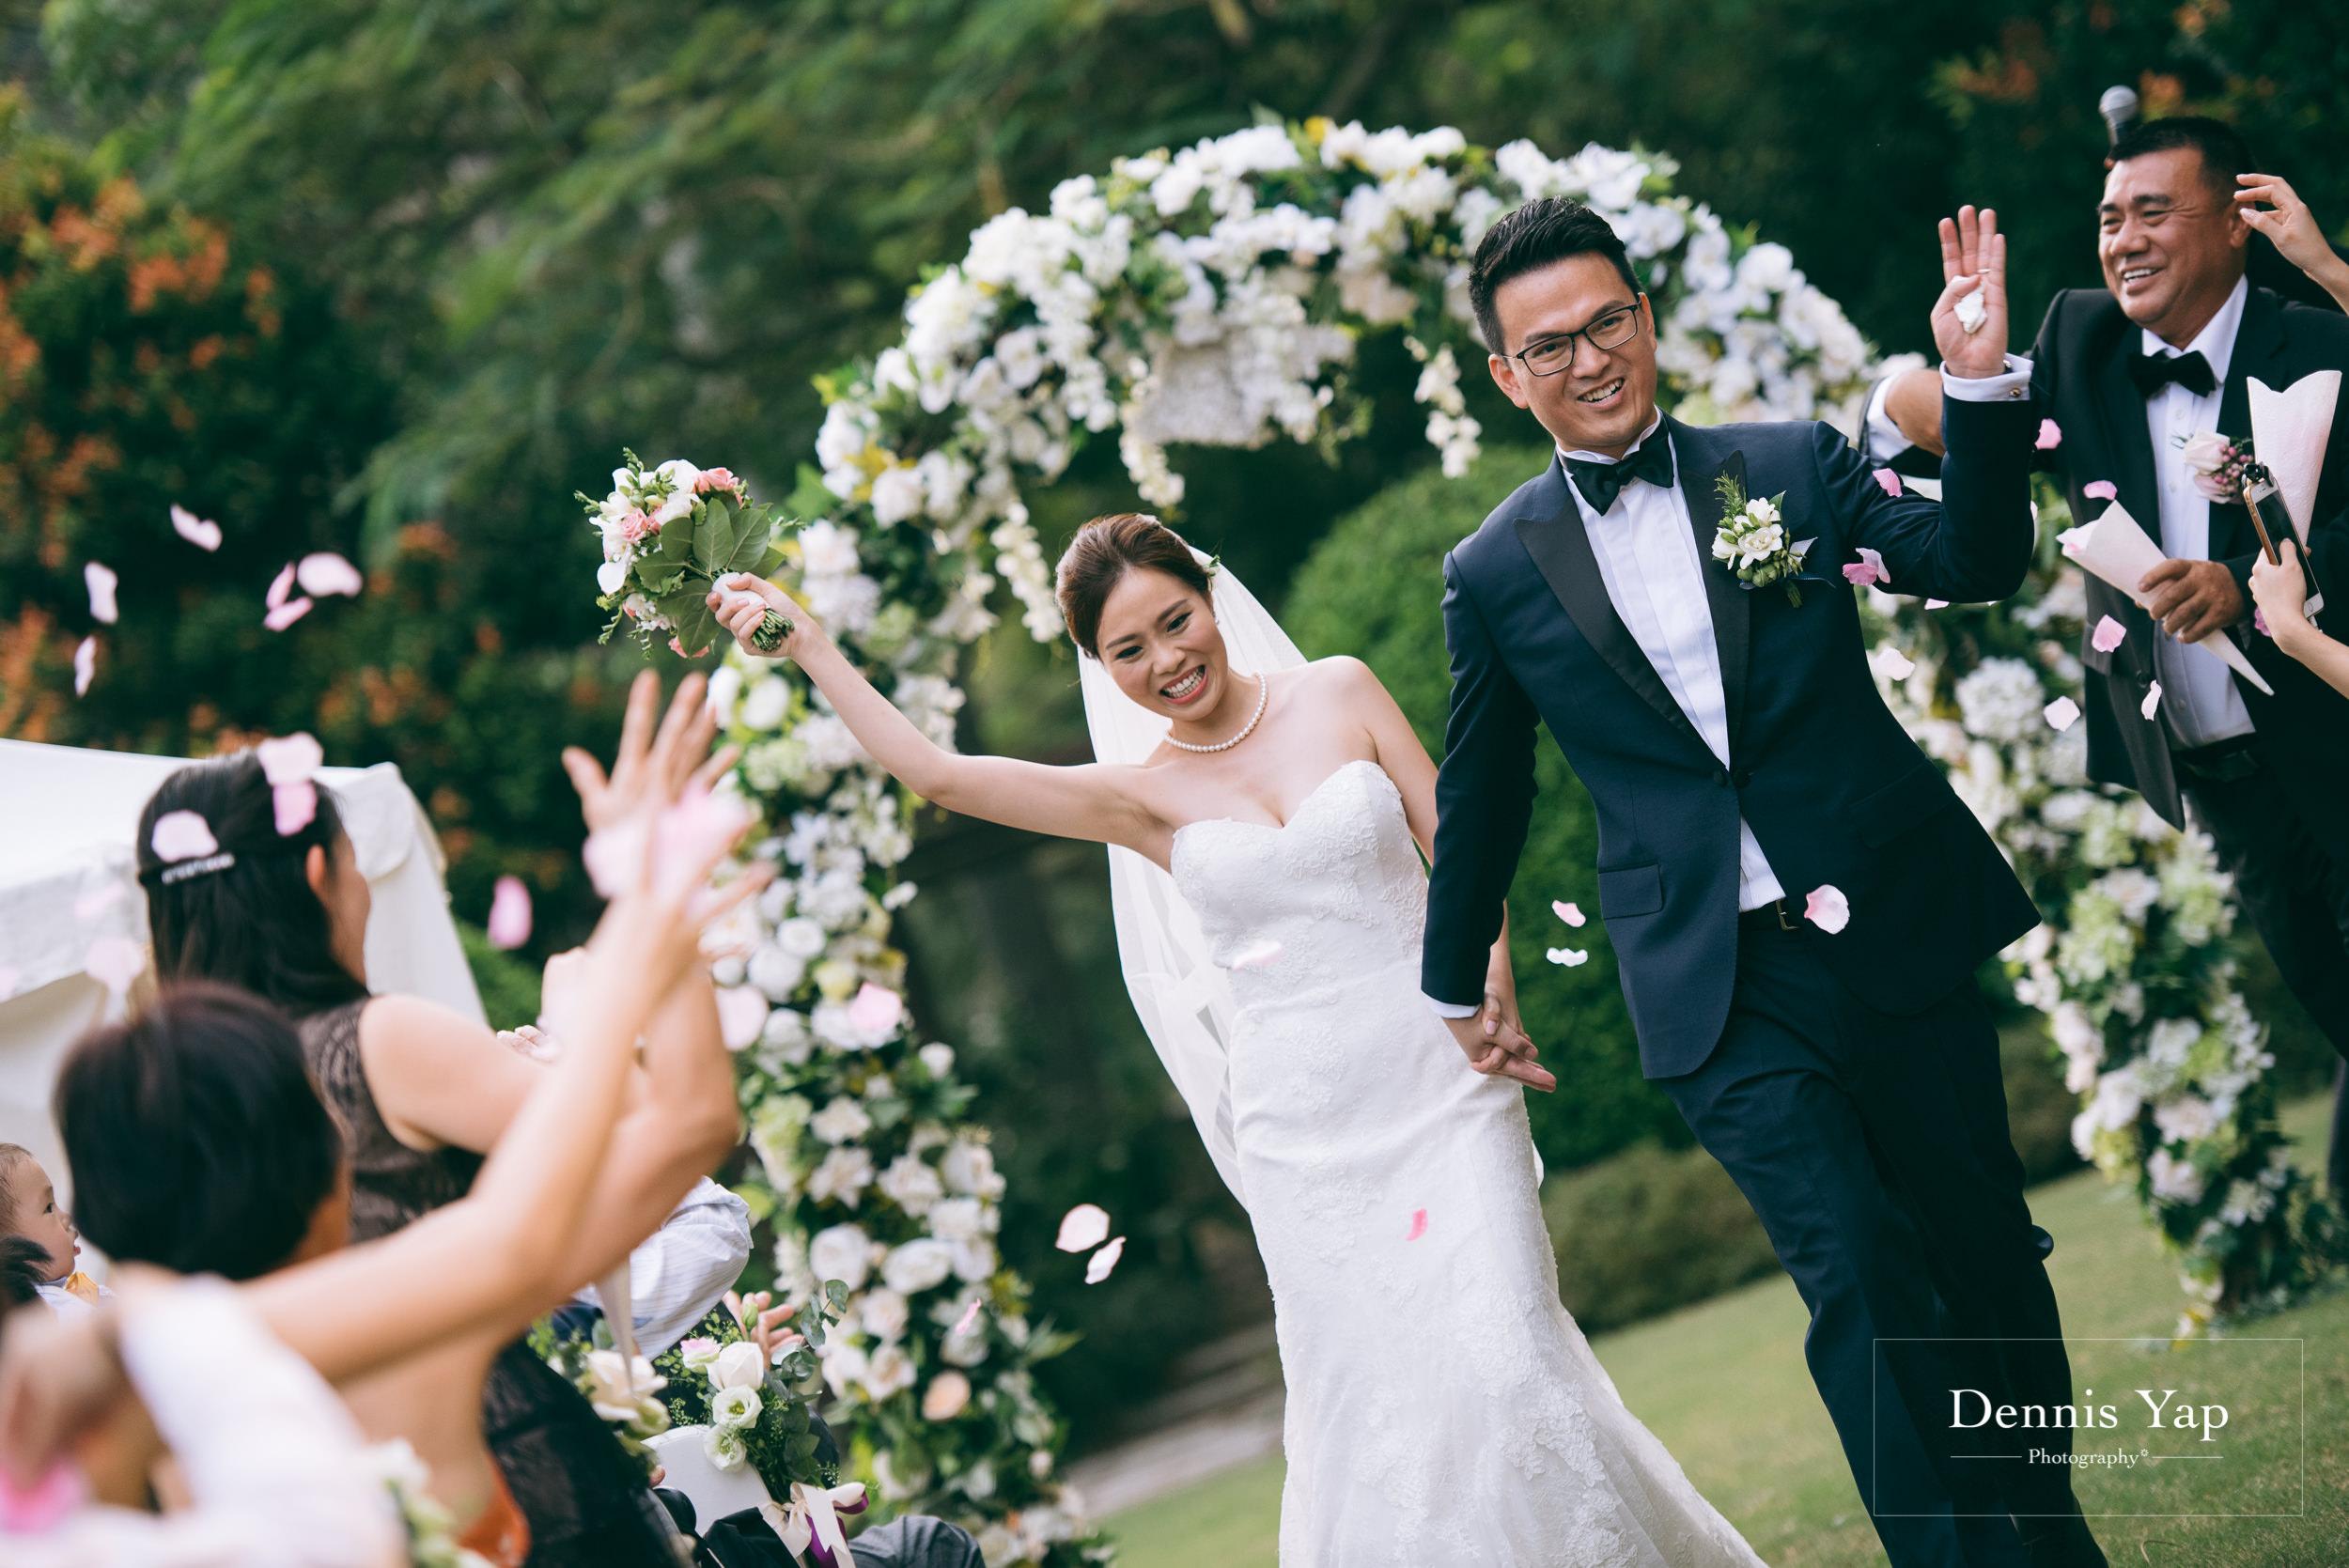 jason crystal wedding day gate crash hong kong garden wedding dennis yap photography-32.jpg